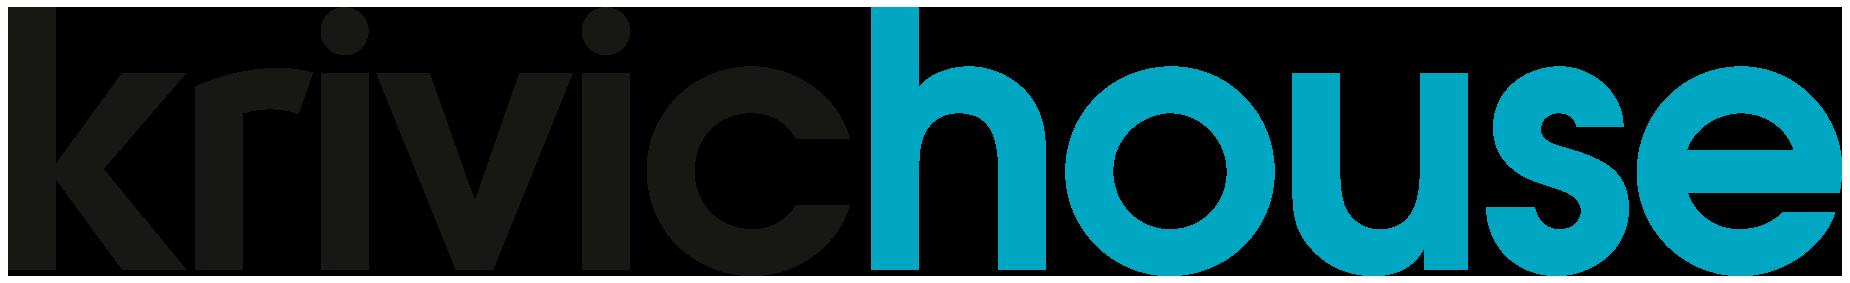 krivic-house-logo.png